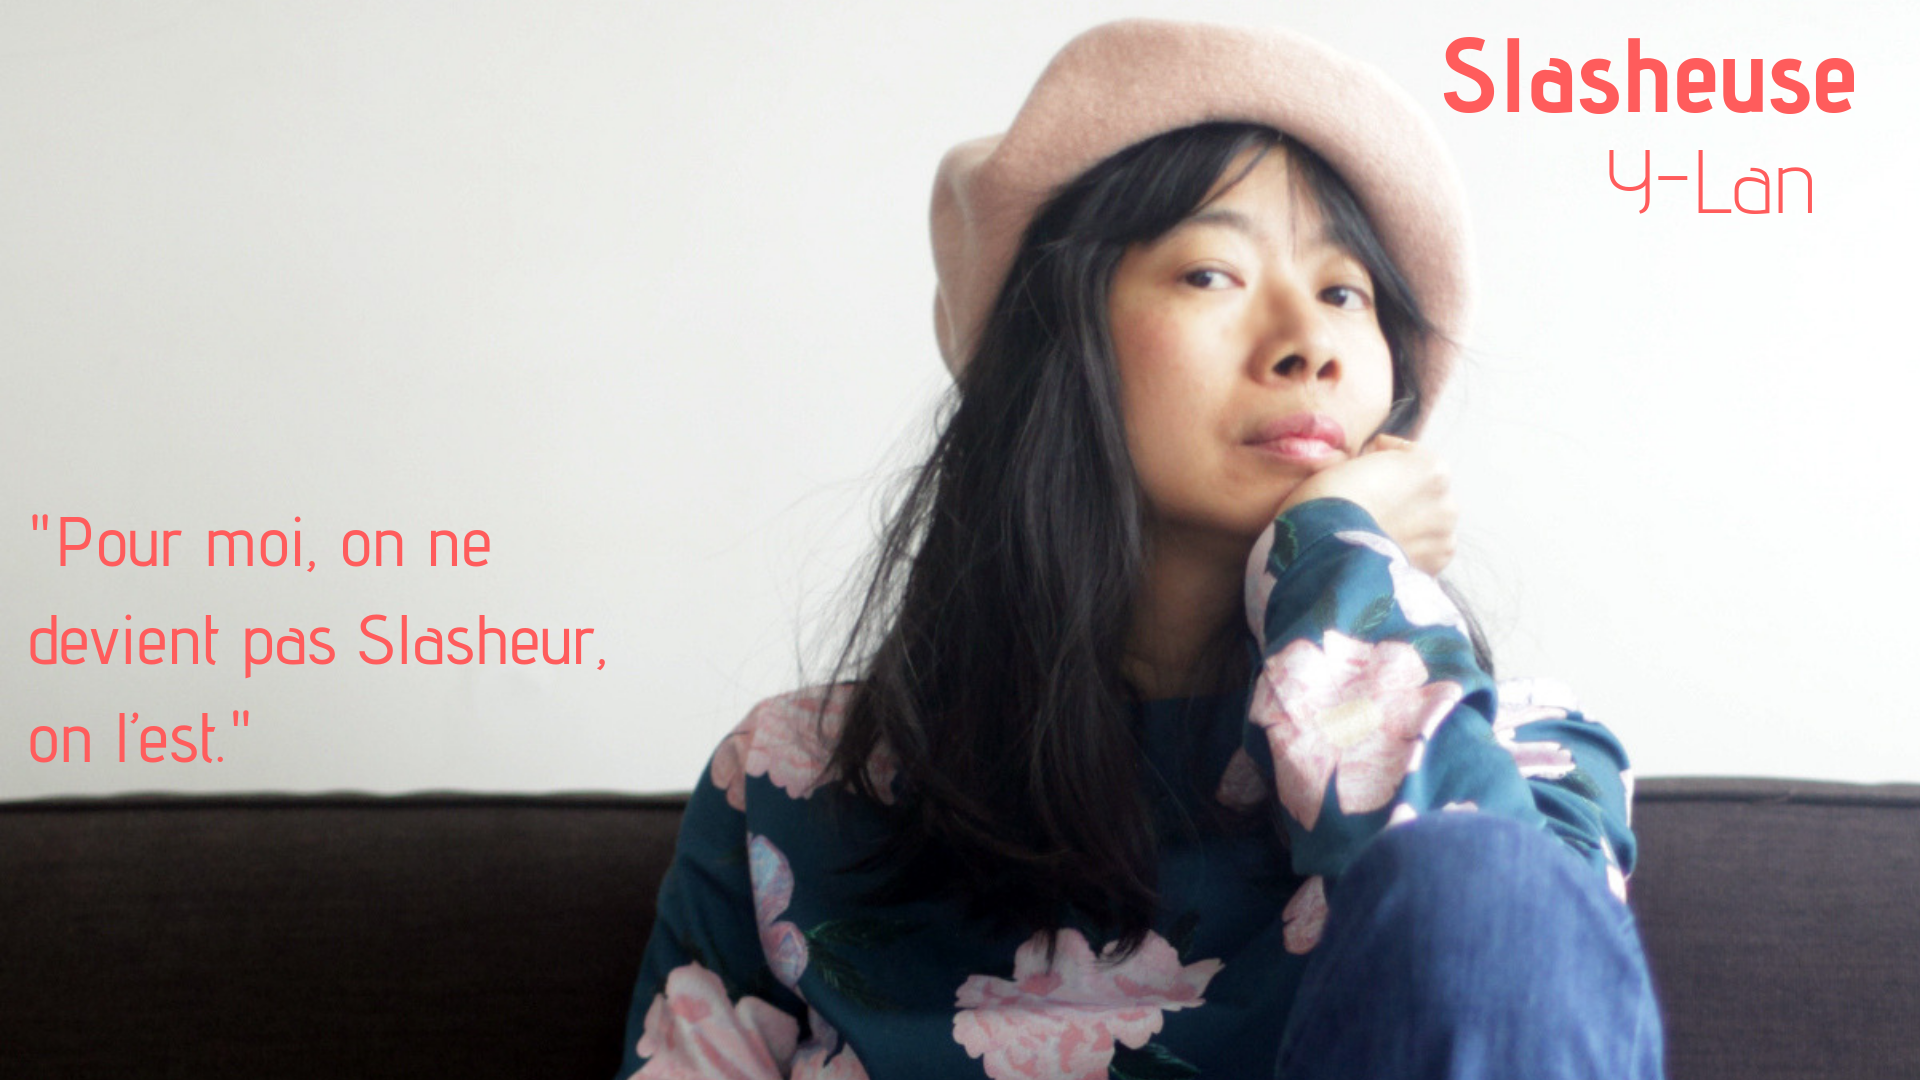 Y-Lan, Slasheuse : Photographe / Blogueuse / Calligraphe / Chanteuse